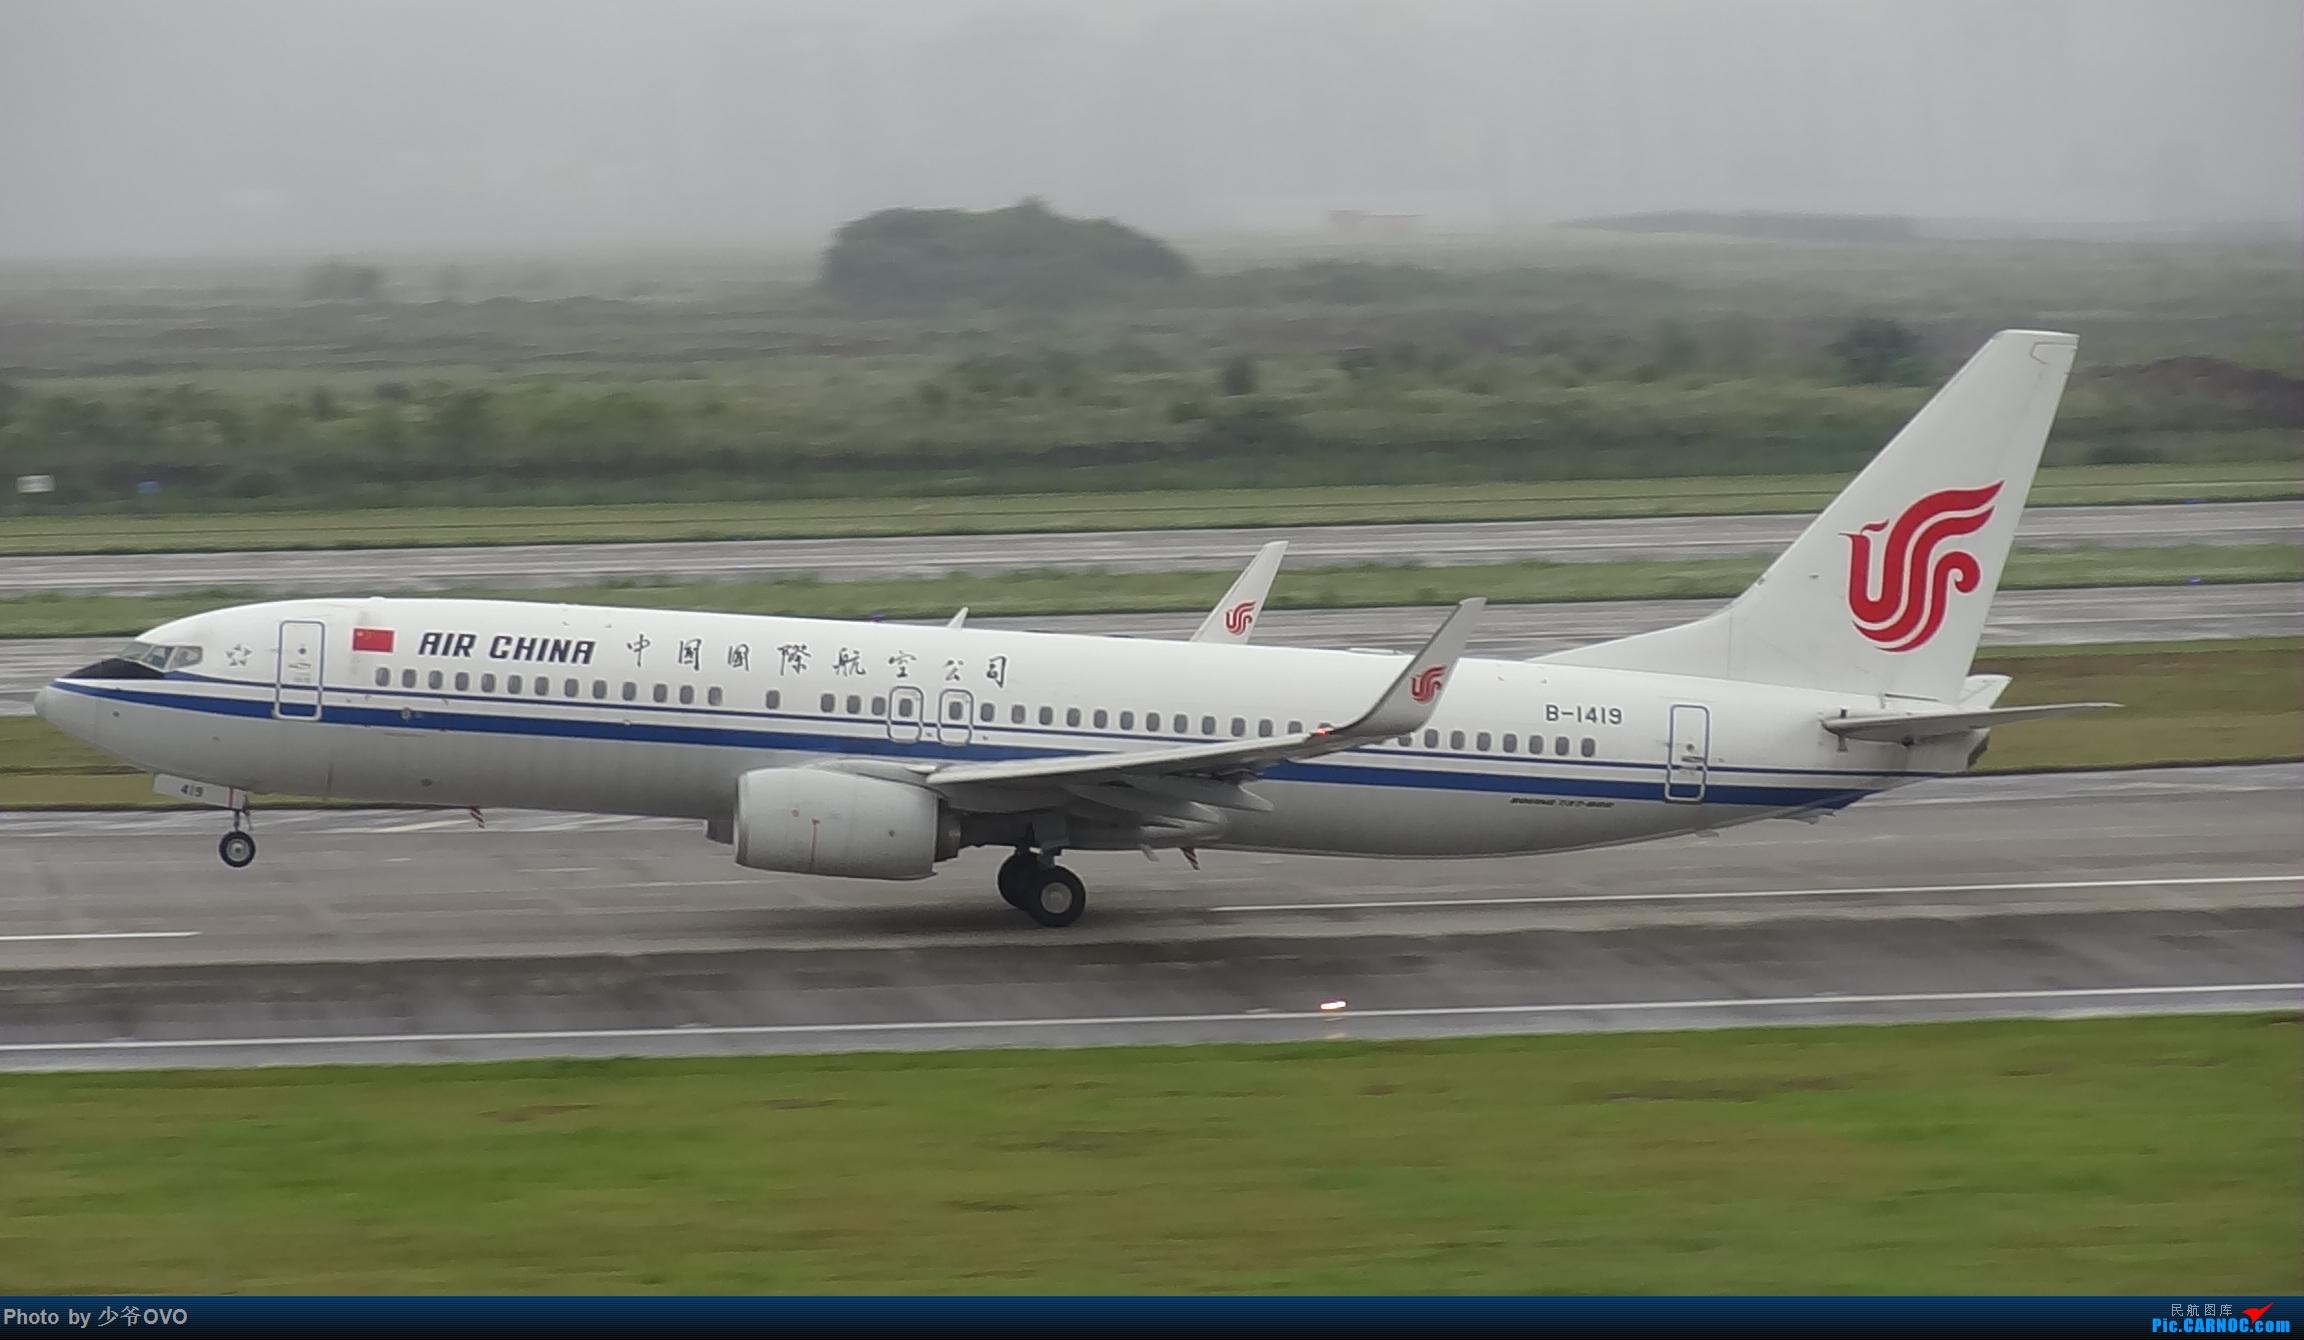 Re:[原创]CKG重庆江北机场拍机 ,中法建交50周年 BOEING 737-800 B-1419 中国重庆江北国际机场